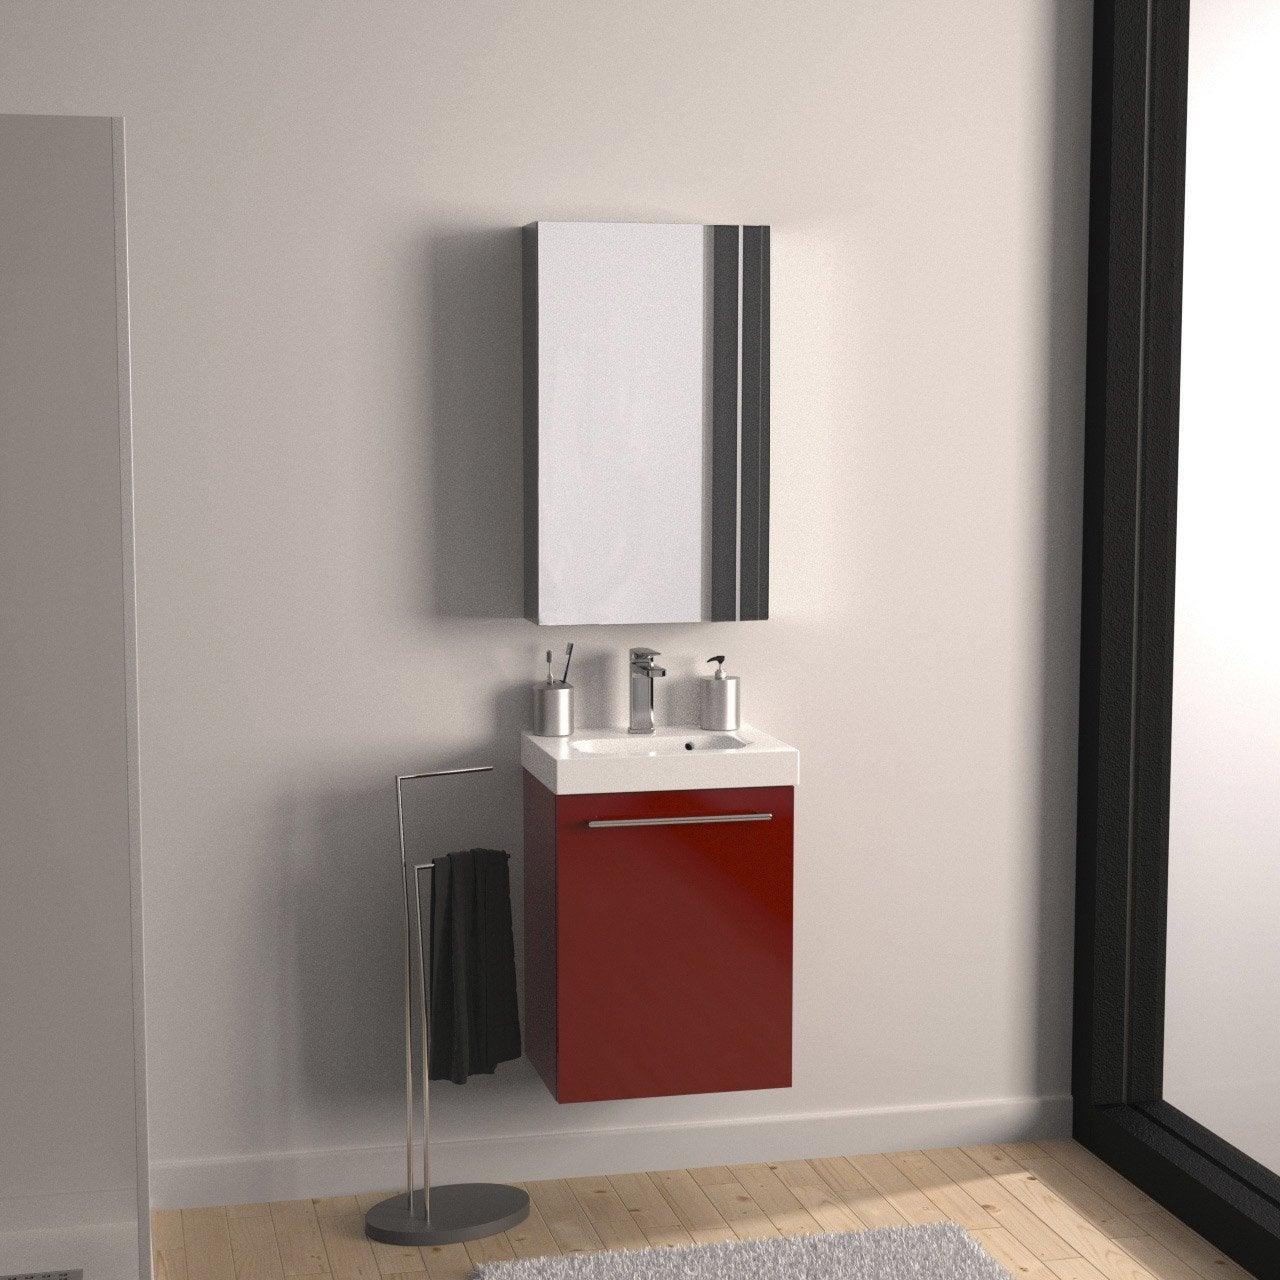 Meuble de salle de bains moins de 60 rouge remix leroy for Meuble tv leroy merlin